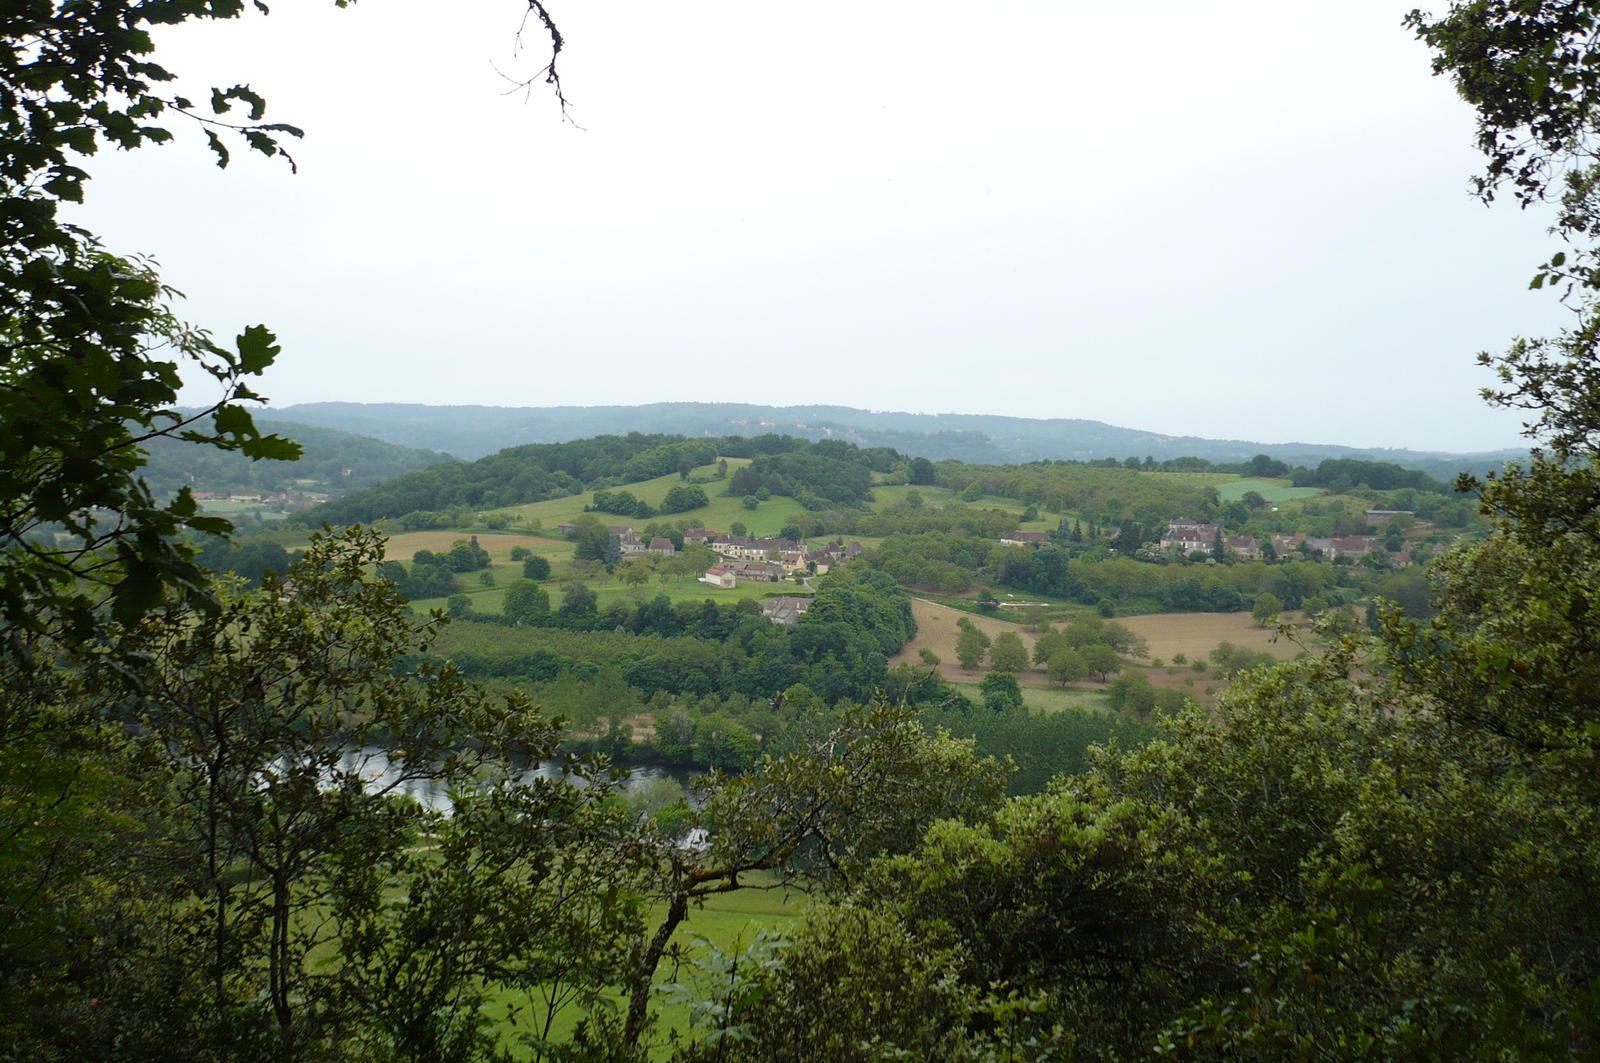 vallee de Dordogne 2 by nicolapin